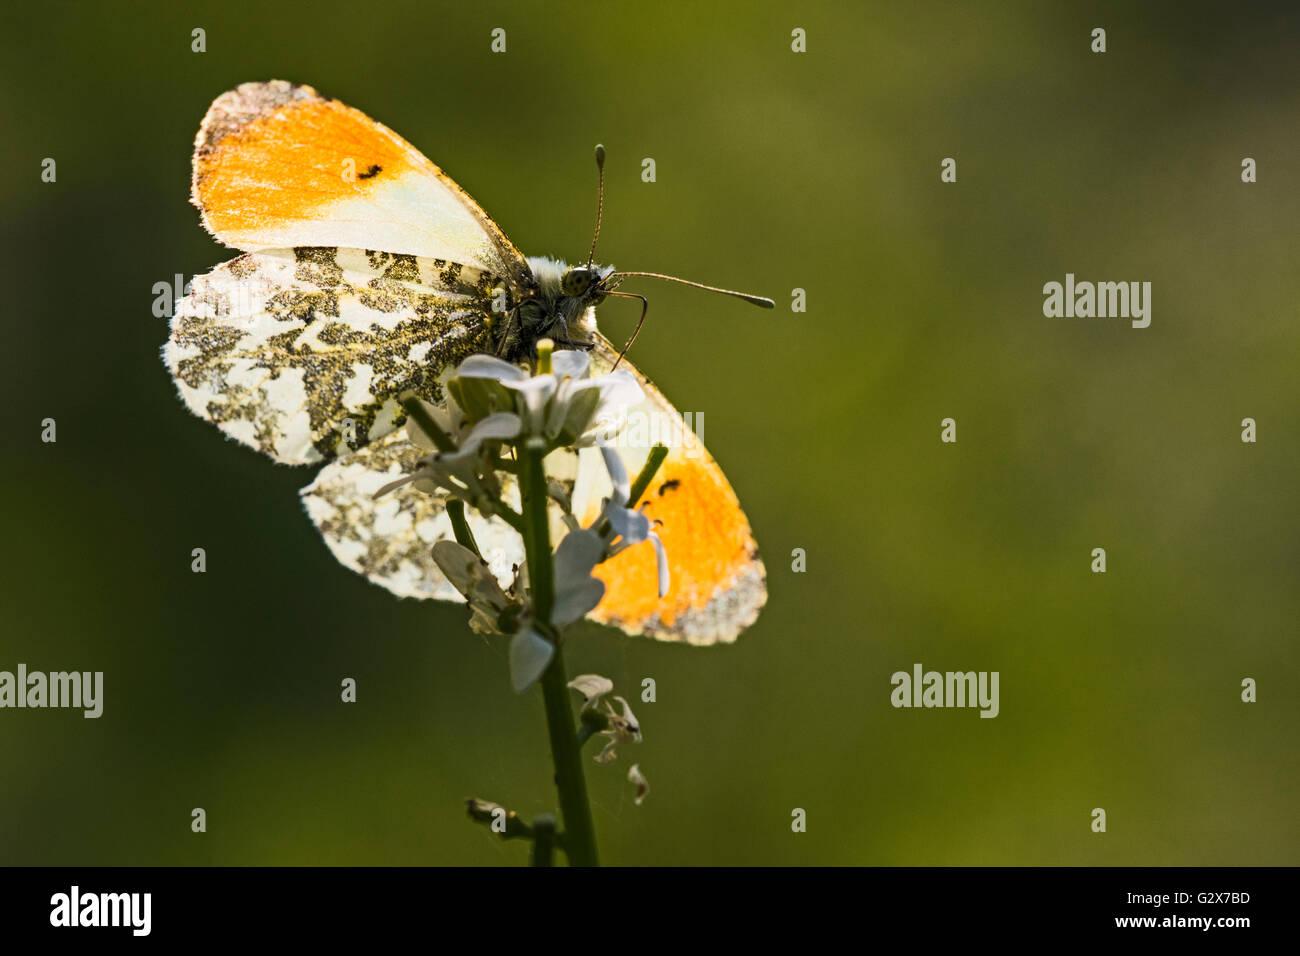 Male Orange Tip butterfly (Anthocharis cardamines nectaring on Garlic Mustard (Alliaria petiolata), Cambridgeshire, - Stock Image